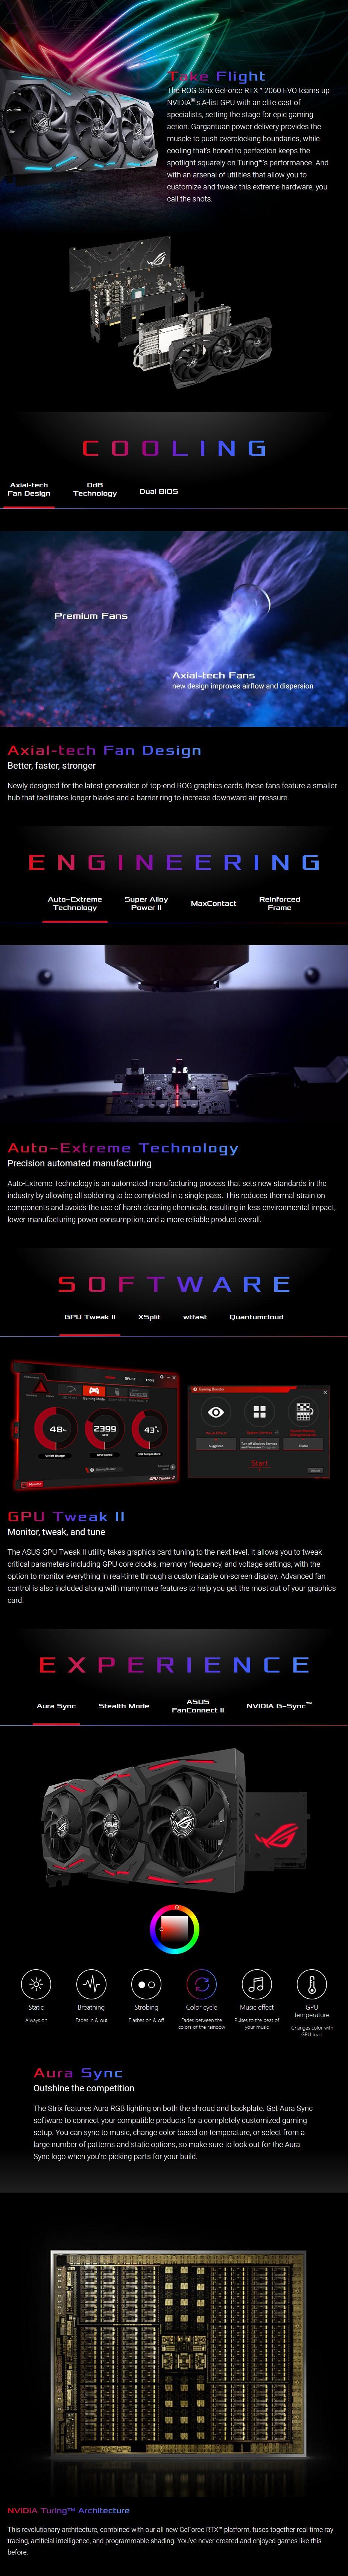 asus-geforce-rtx-2060-rog-strix-evo-gaming-6gb-video-card-ac33959-8.jpg